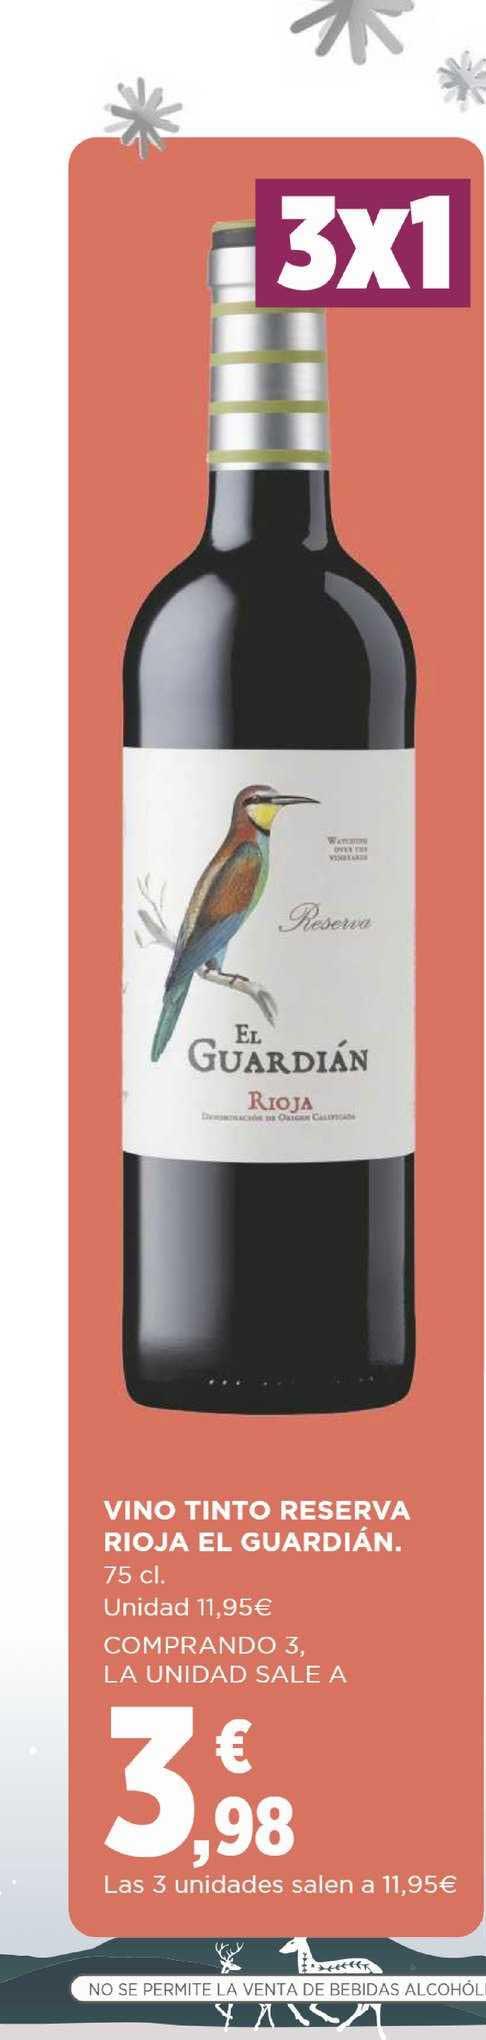 Supercor Vino Tinto Reseva Rioja El Guardián